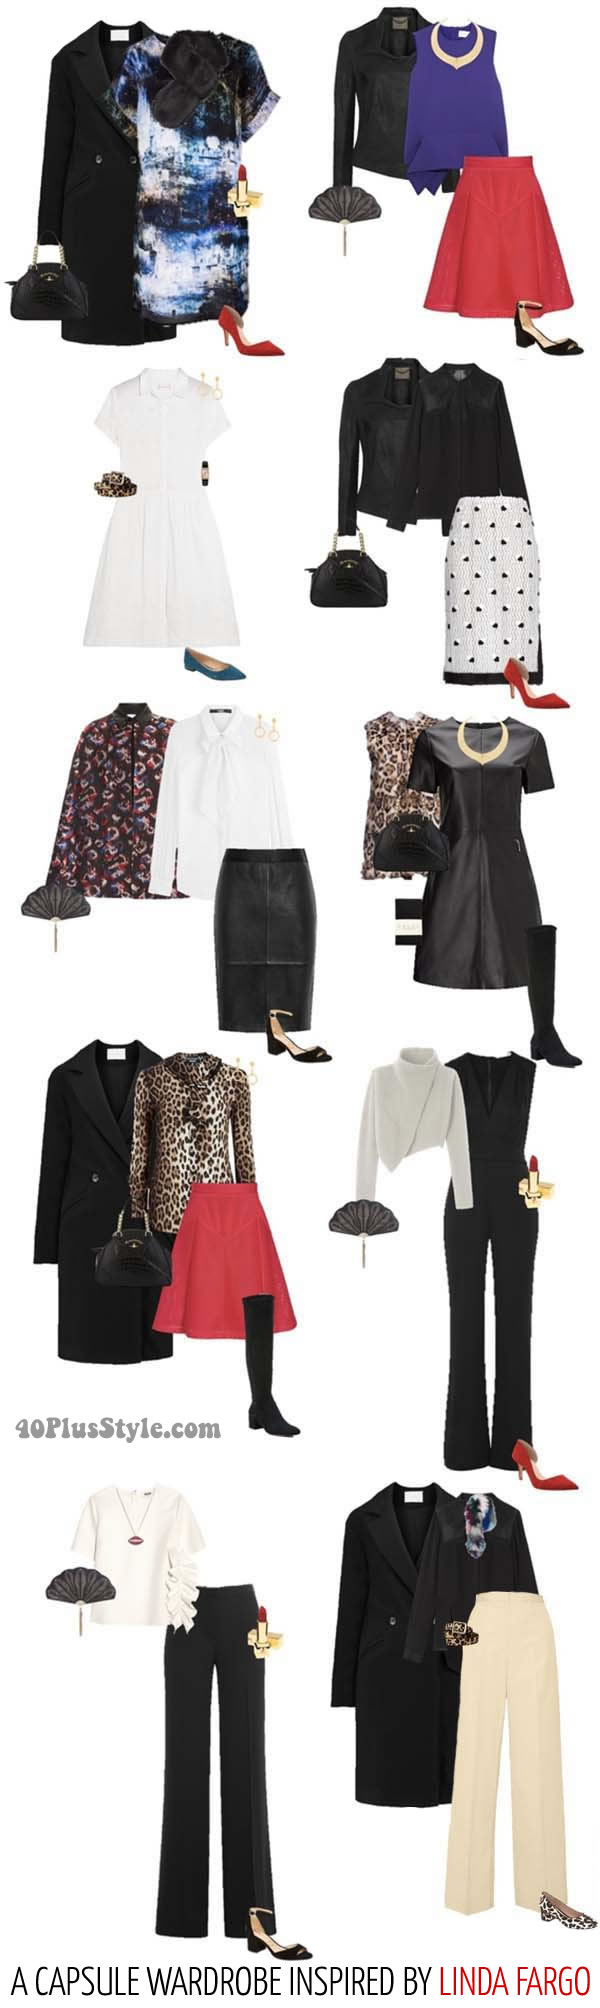 how-to-dress-linda-fargao